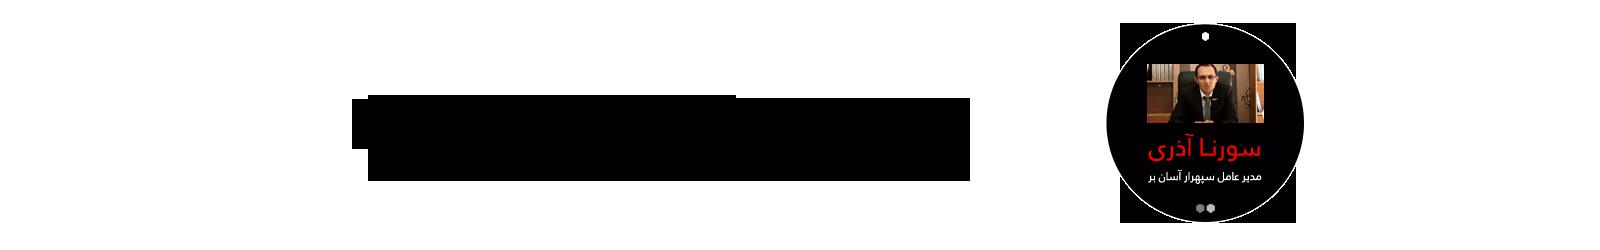 Azari-dayereh(1)